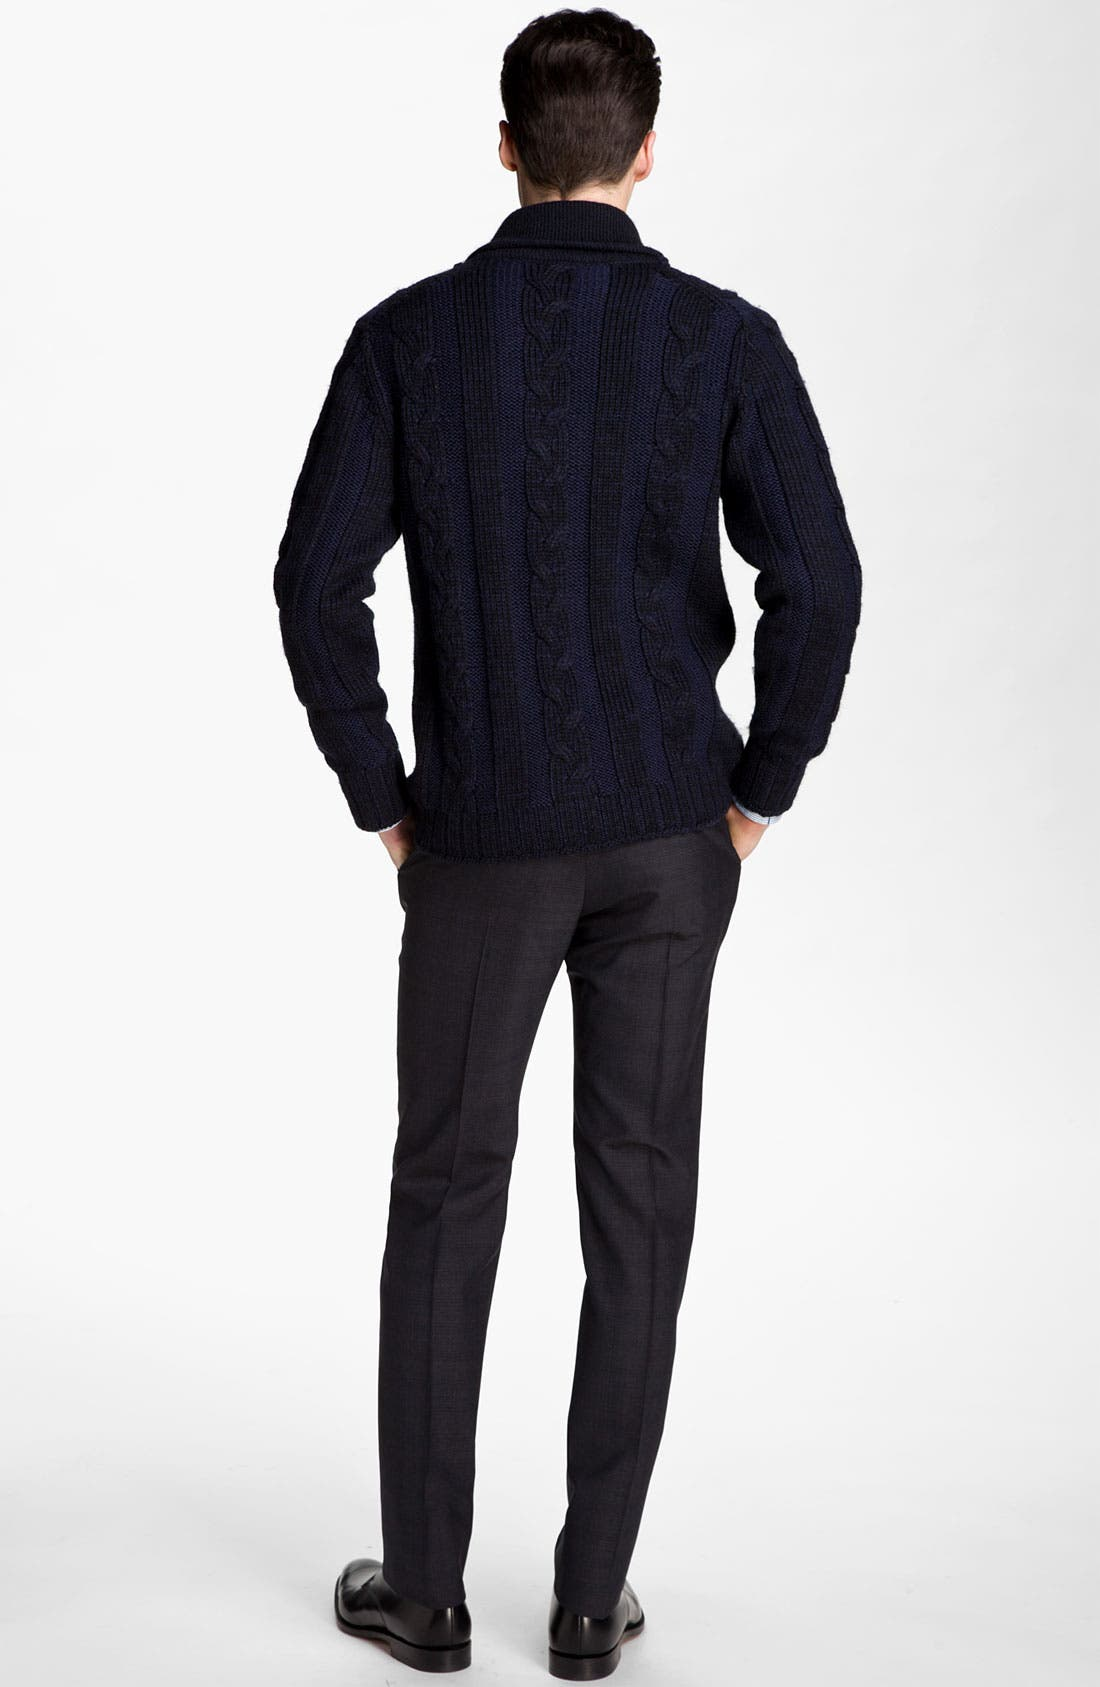 Main Image - Paul Smith London Sweater, Dress Shirt & Trousers